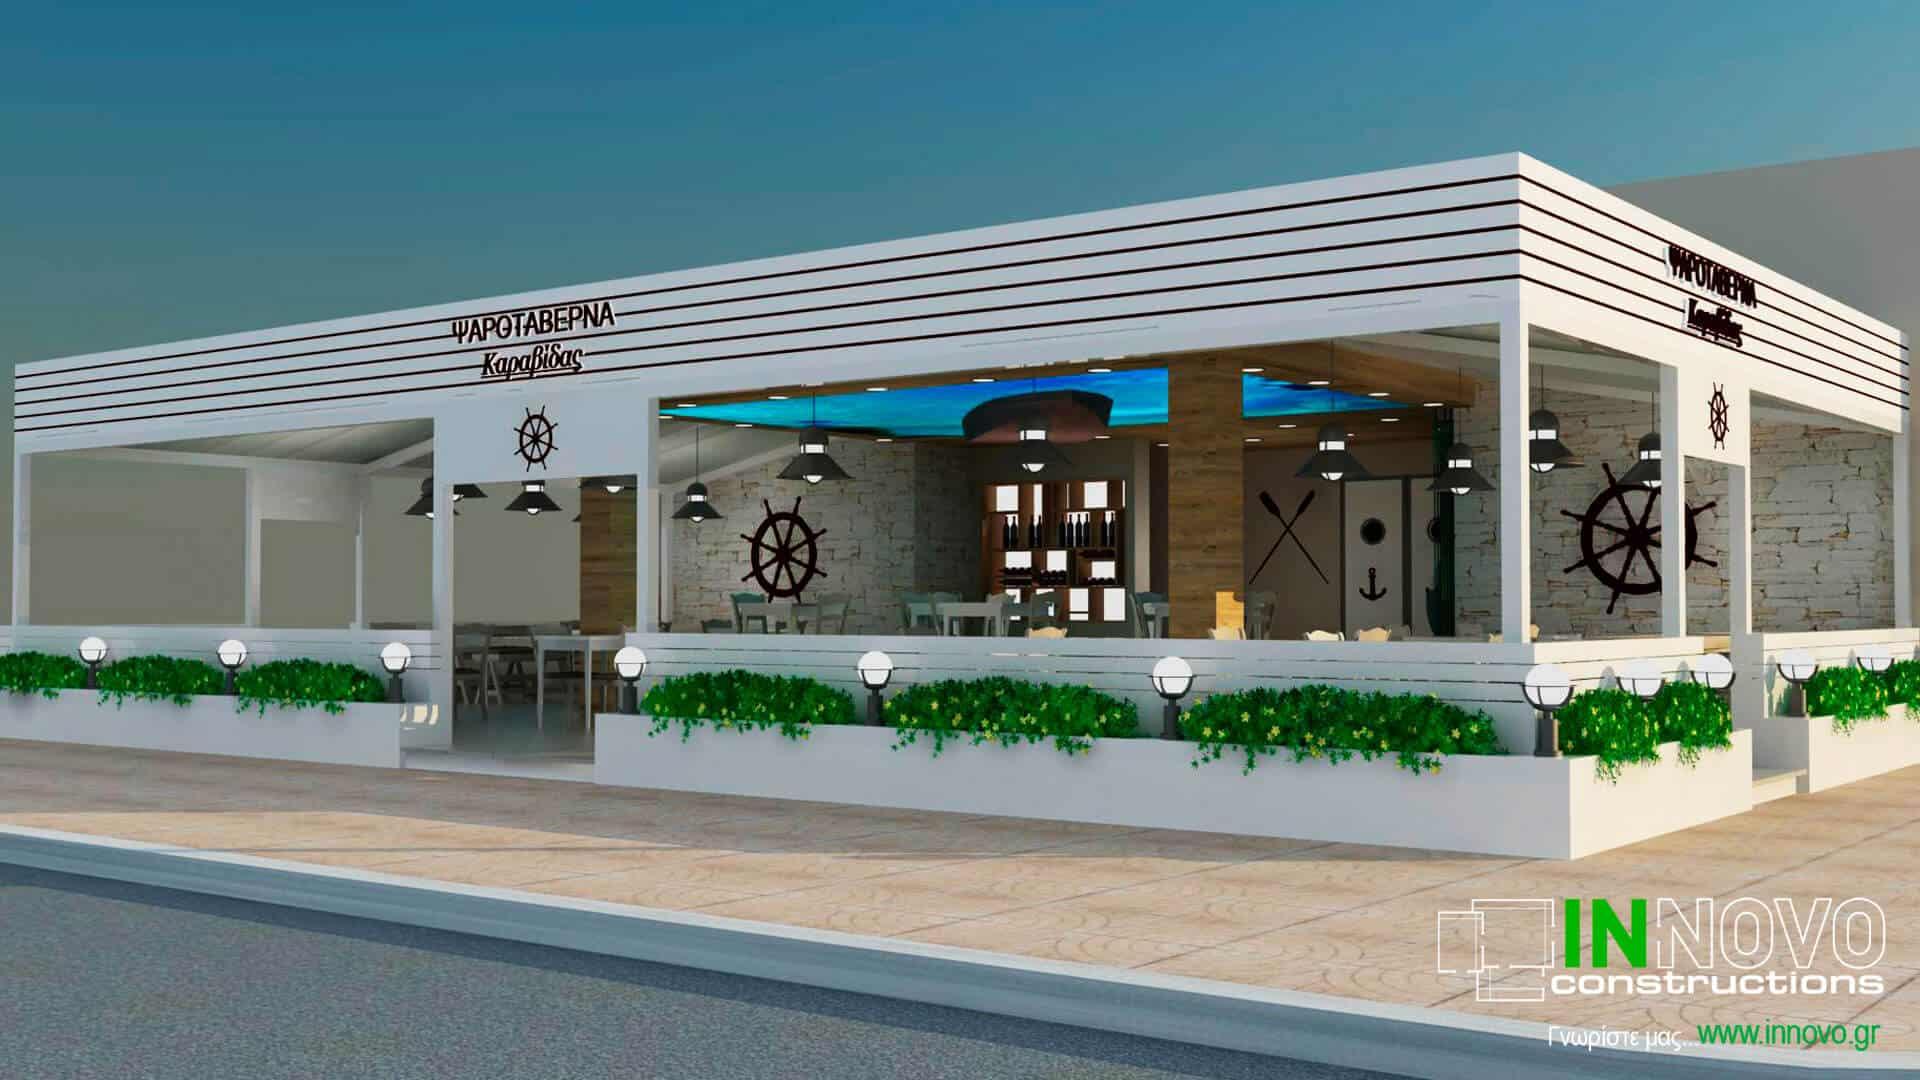 anakainisi-psitopoleiou-restaurant-renovation-psarotaverna-perissos-1414-11-1